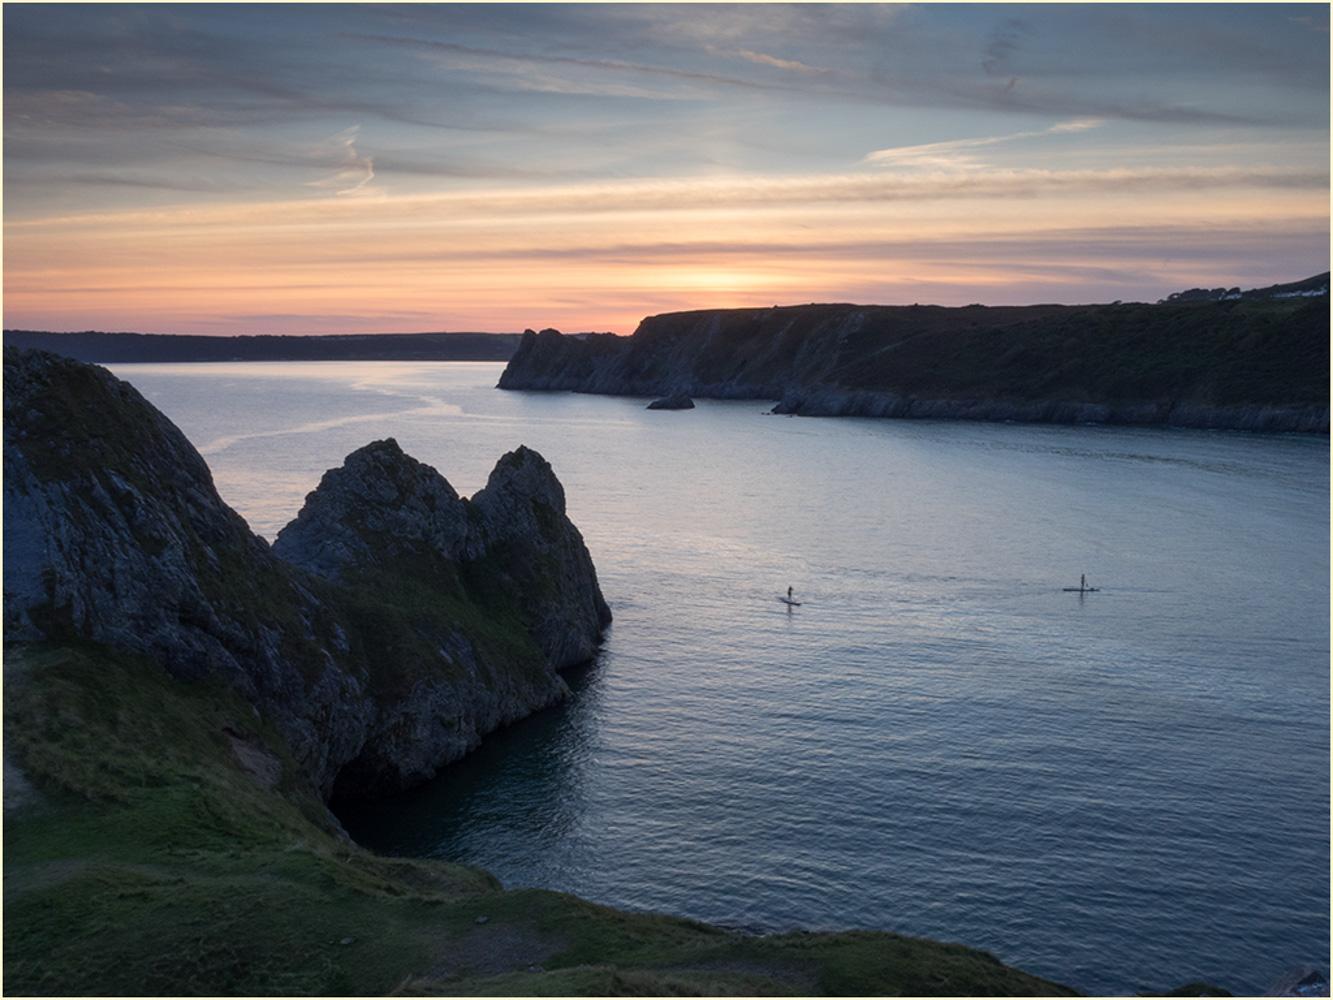 paddling-home-at-sunset-2-2.jpg